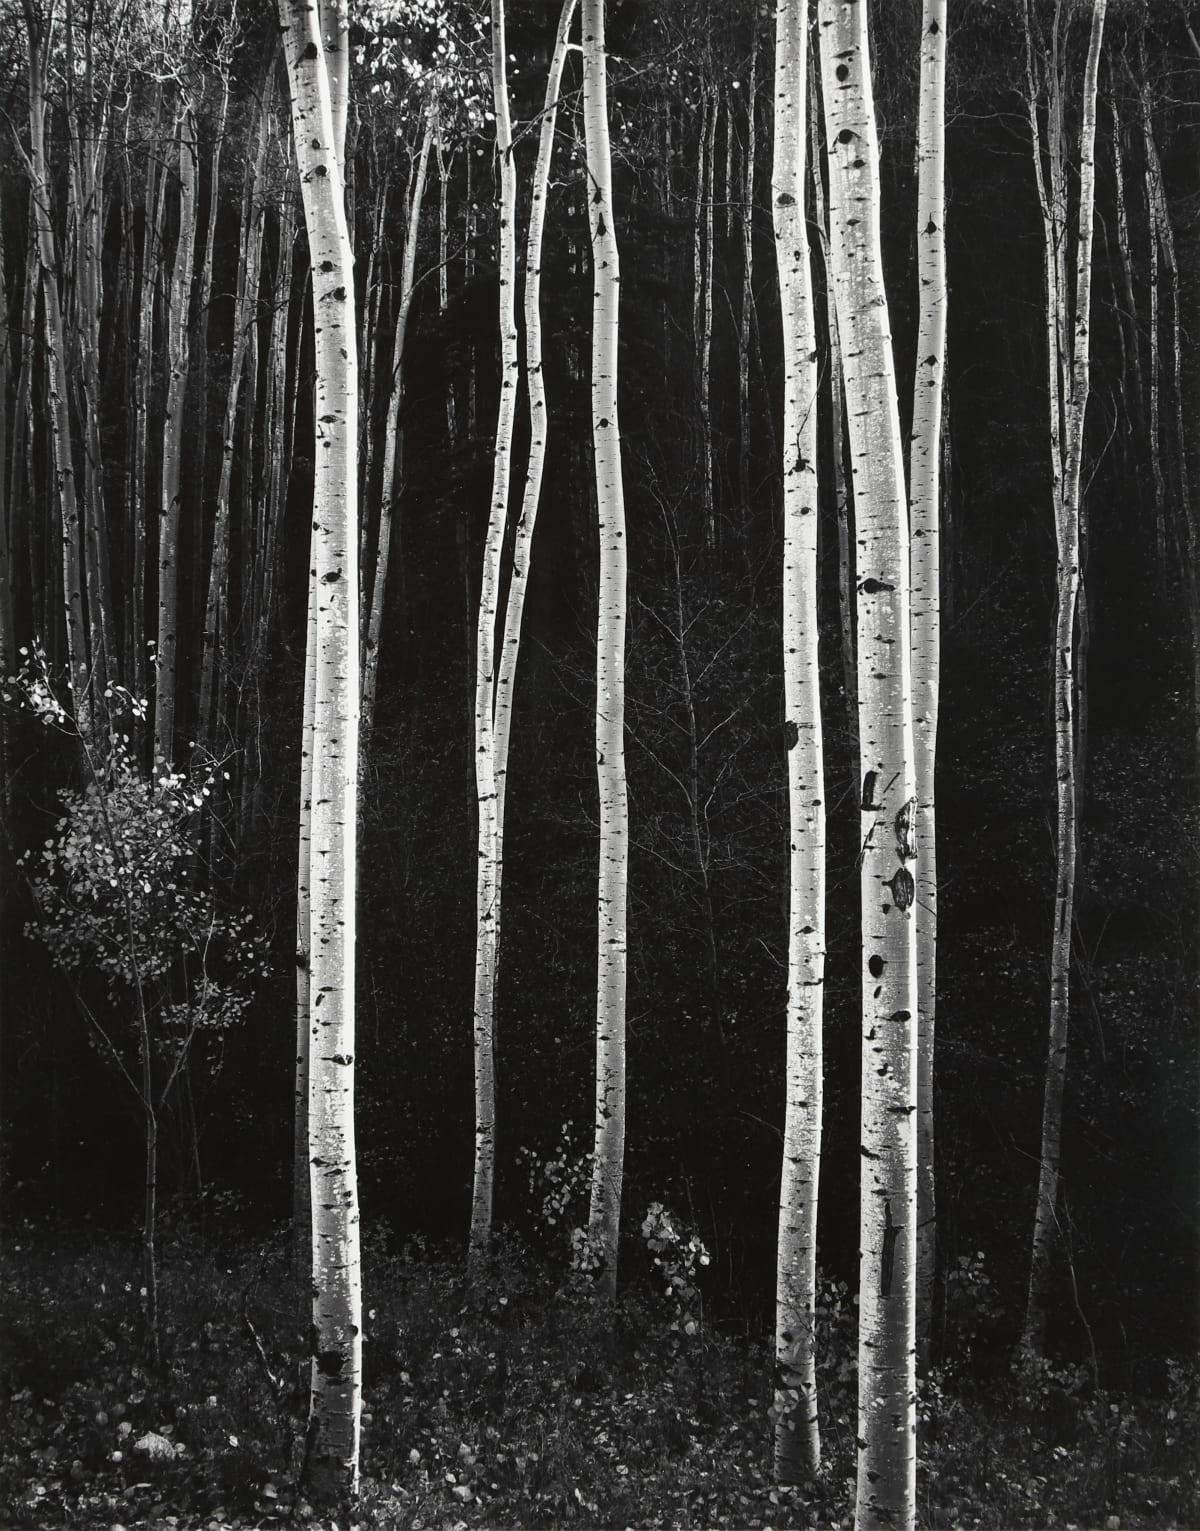 Don Worth, Aspens, Autumn, NM, 1958